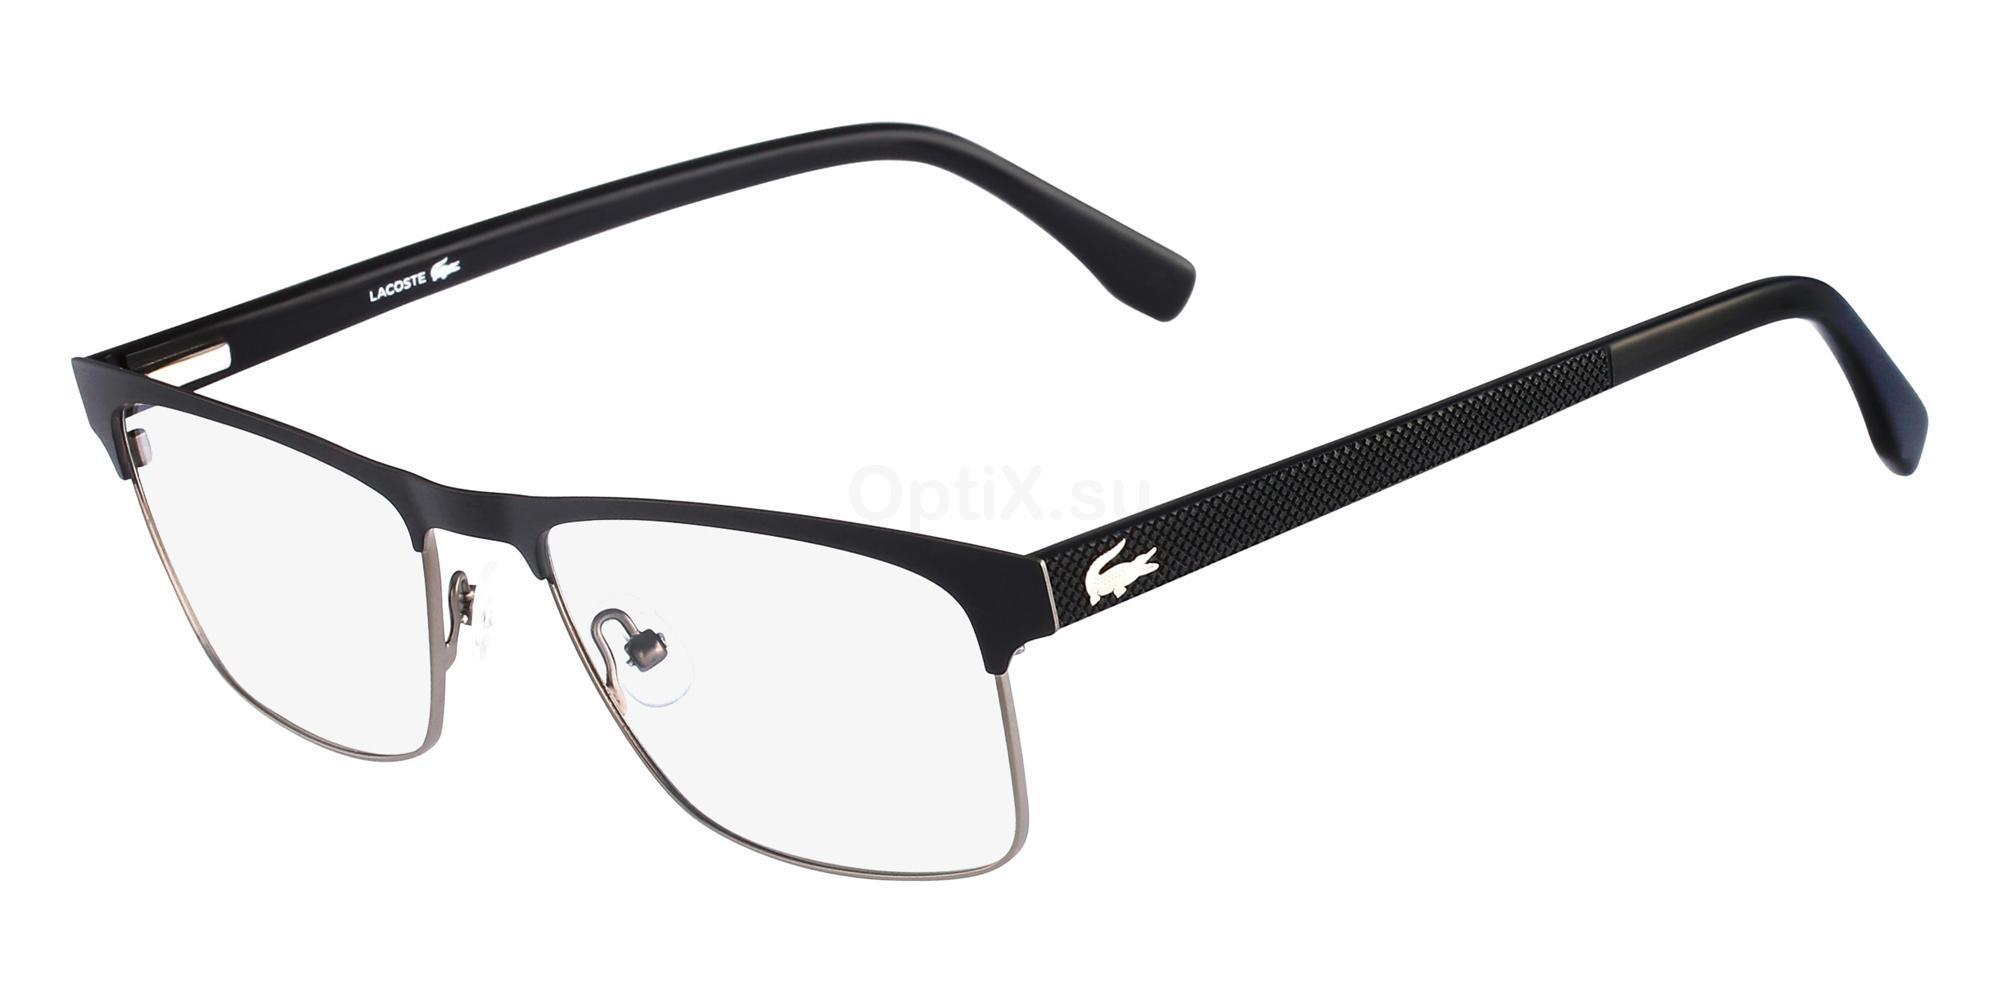 001 L2198 Glasses, Lacoste